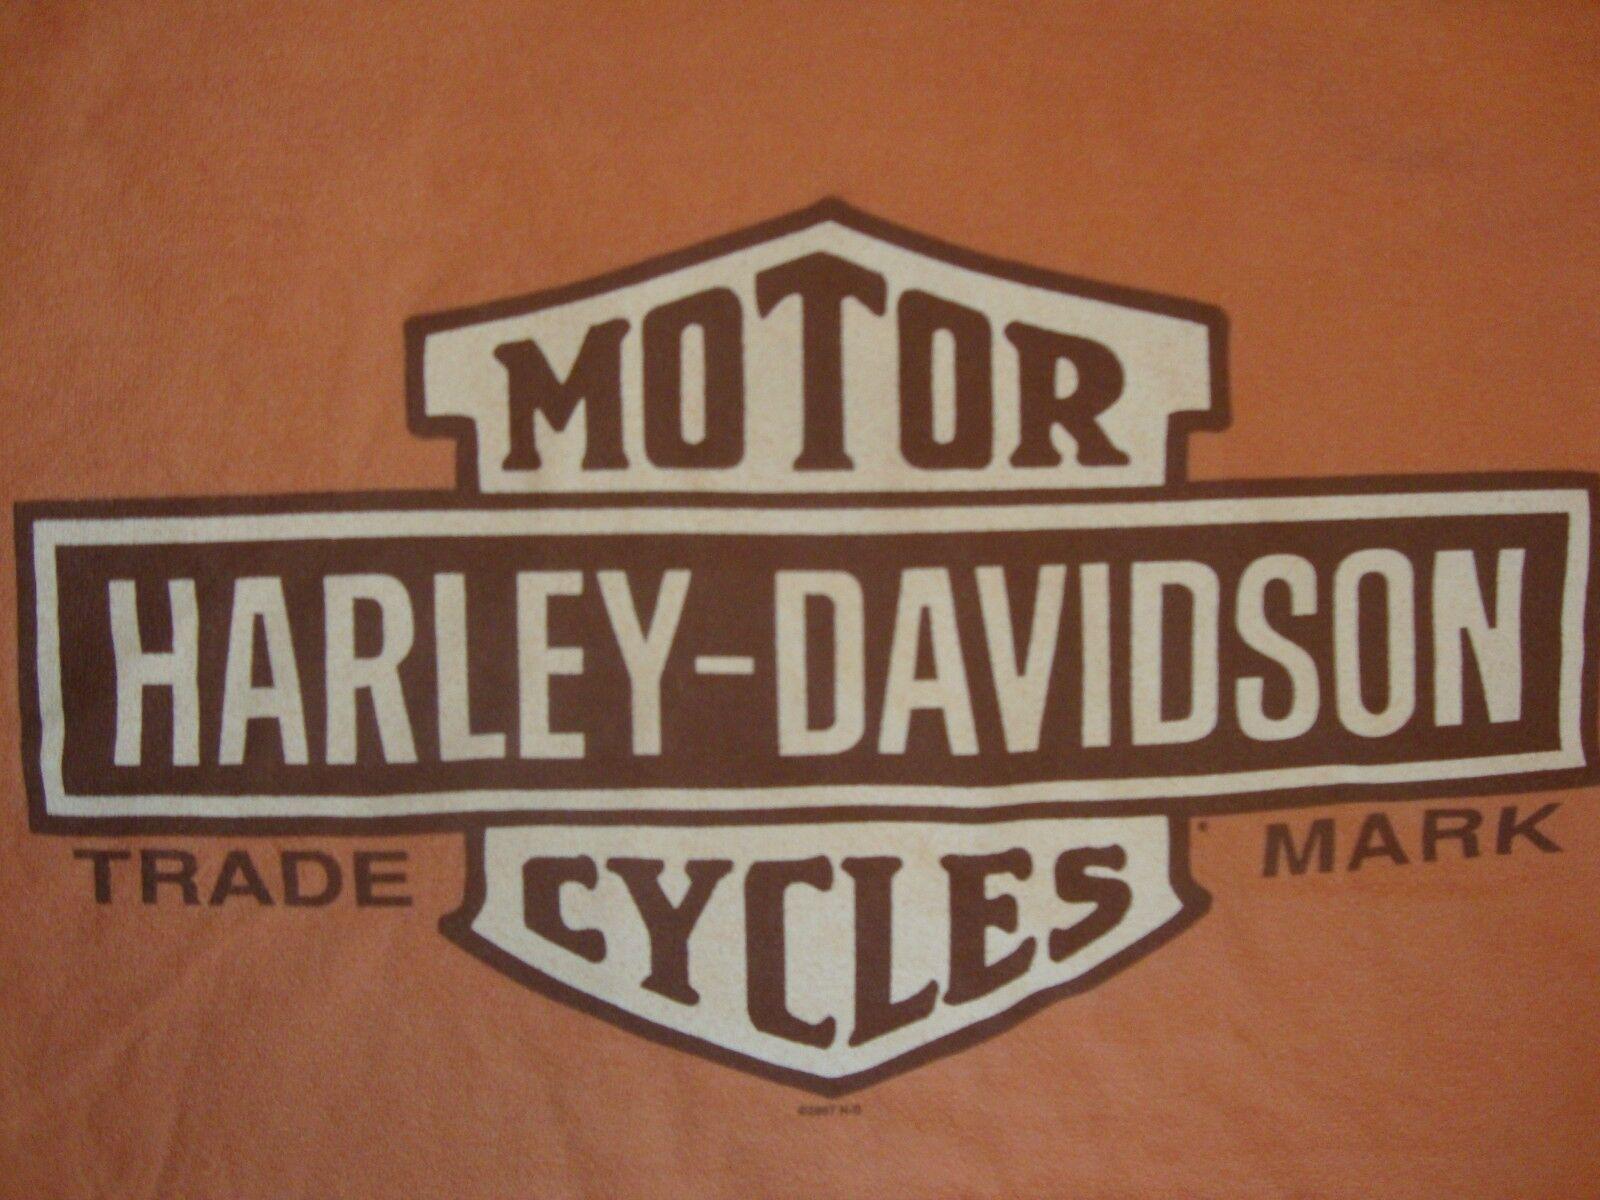 Harley-Davidson Motorcycles Daytona Beach, Florida t shirt Size XL  image 3